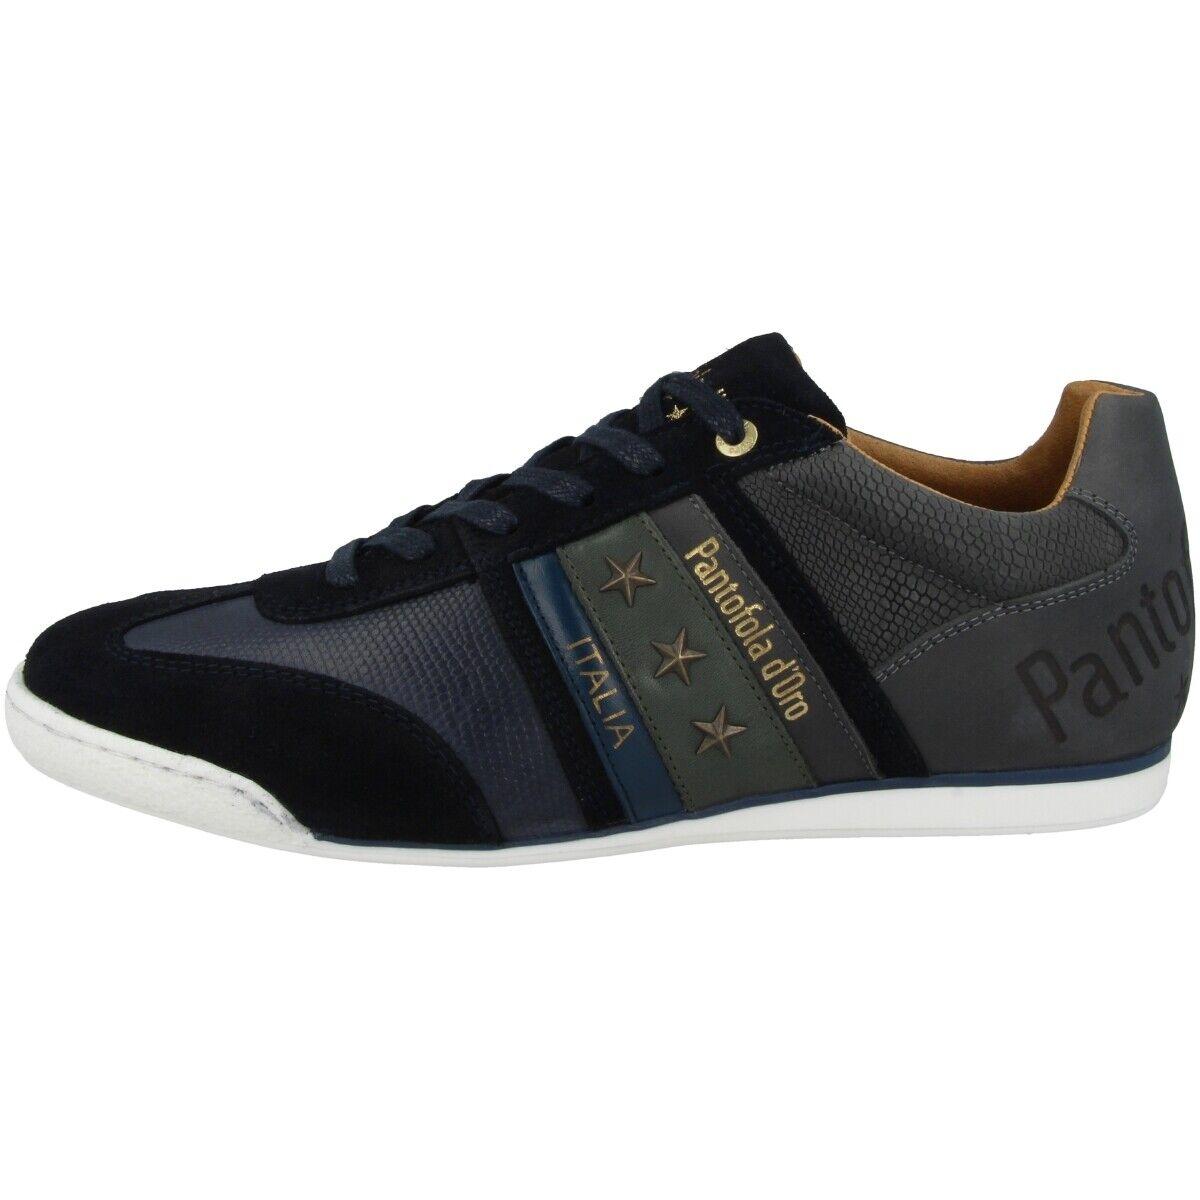 Pantofola d Gold Imola Crocco herren Low Ascoli Schuhe Turnschuhe Blaus 10193038.29Y